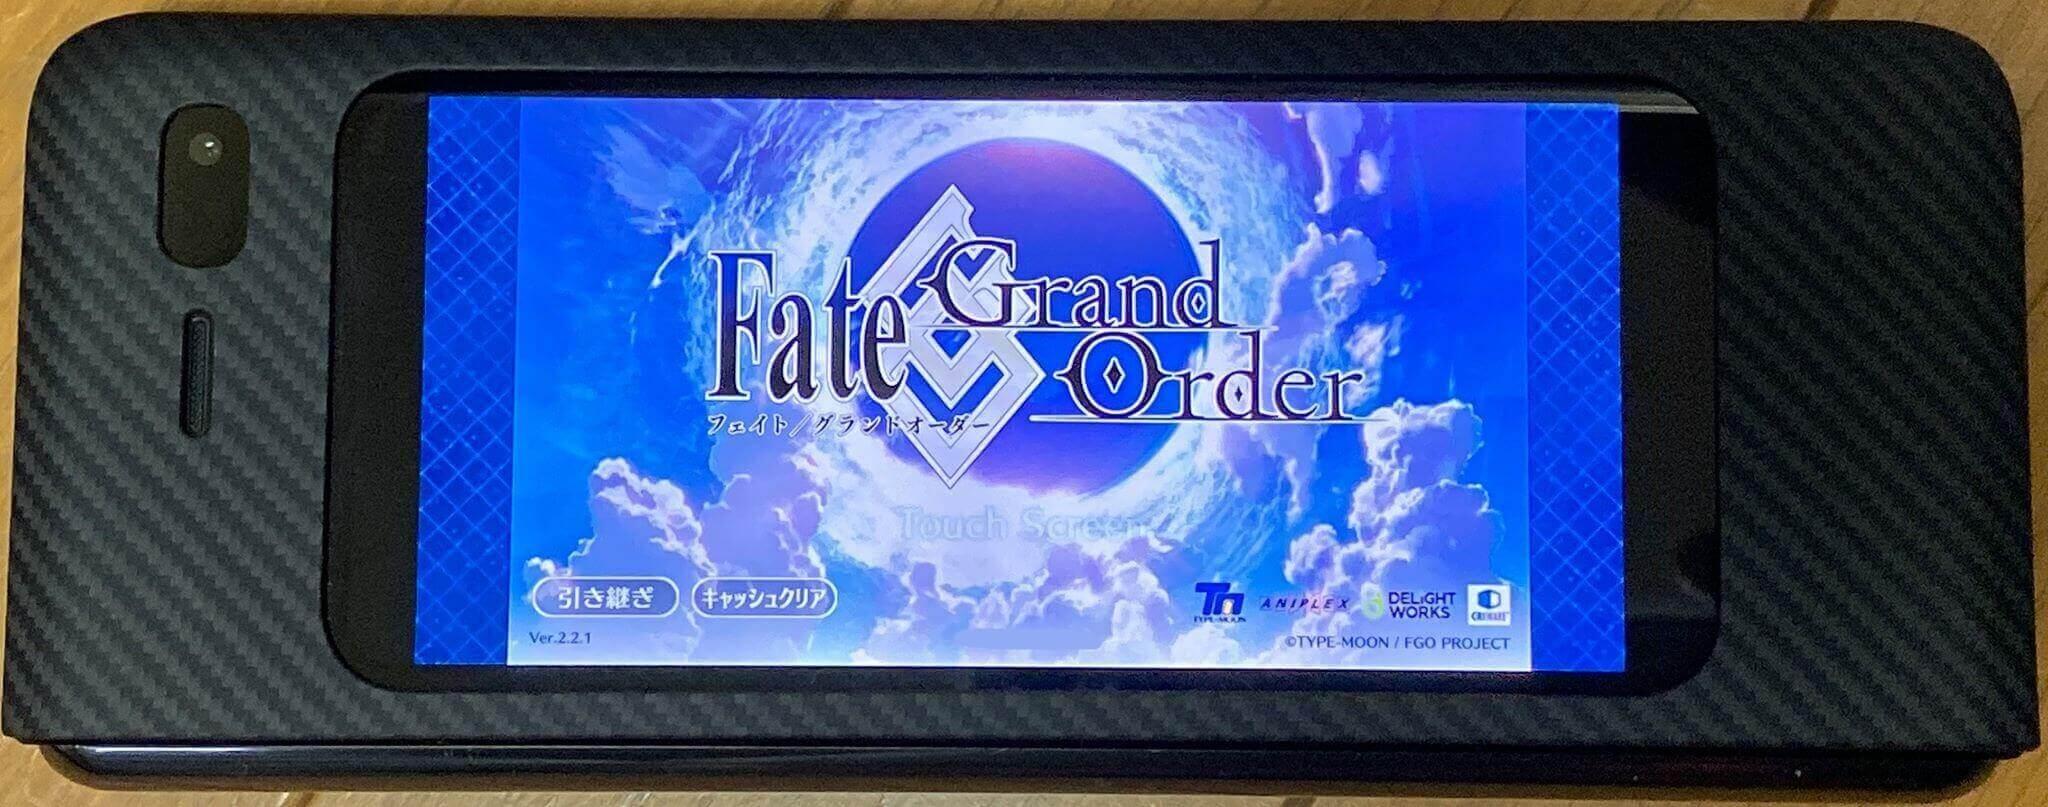 Fate/Grand Orderイメージ サブ画面